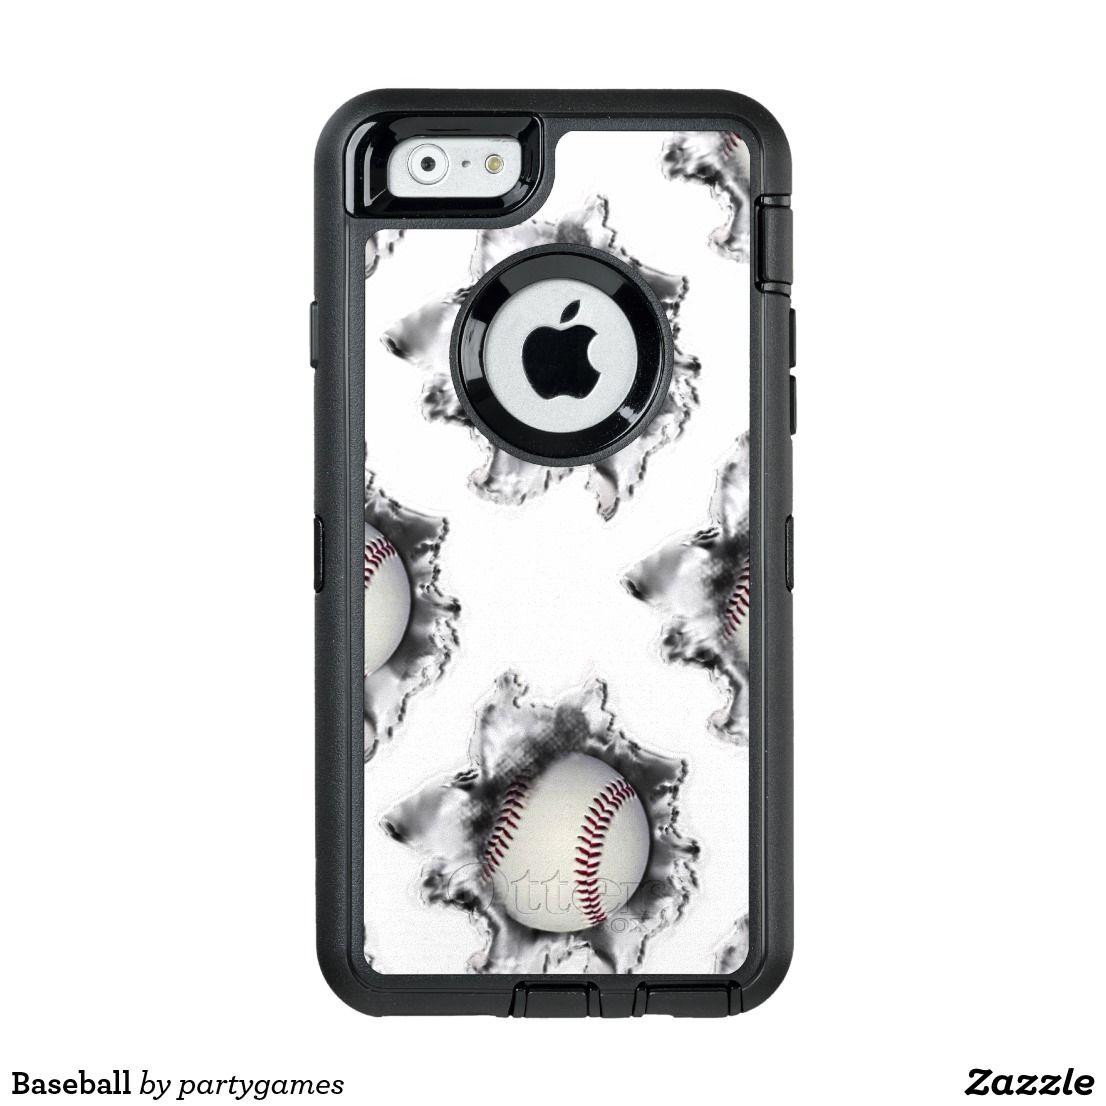 reputable site 33db5 0c38a Baseball OtterBox iPhone Case   Zazzle.com   Baseball   Iphone case ...